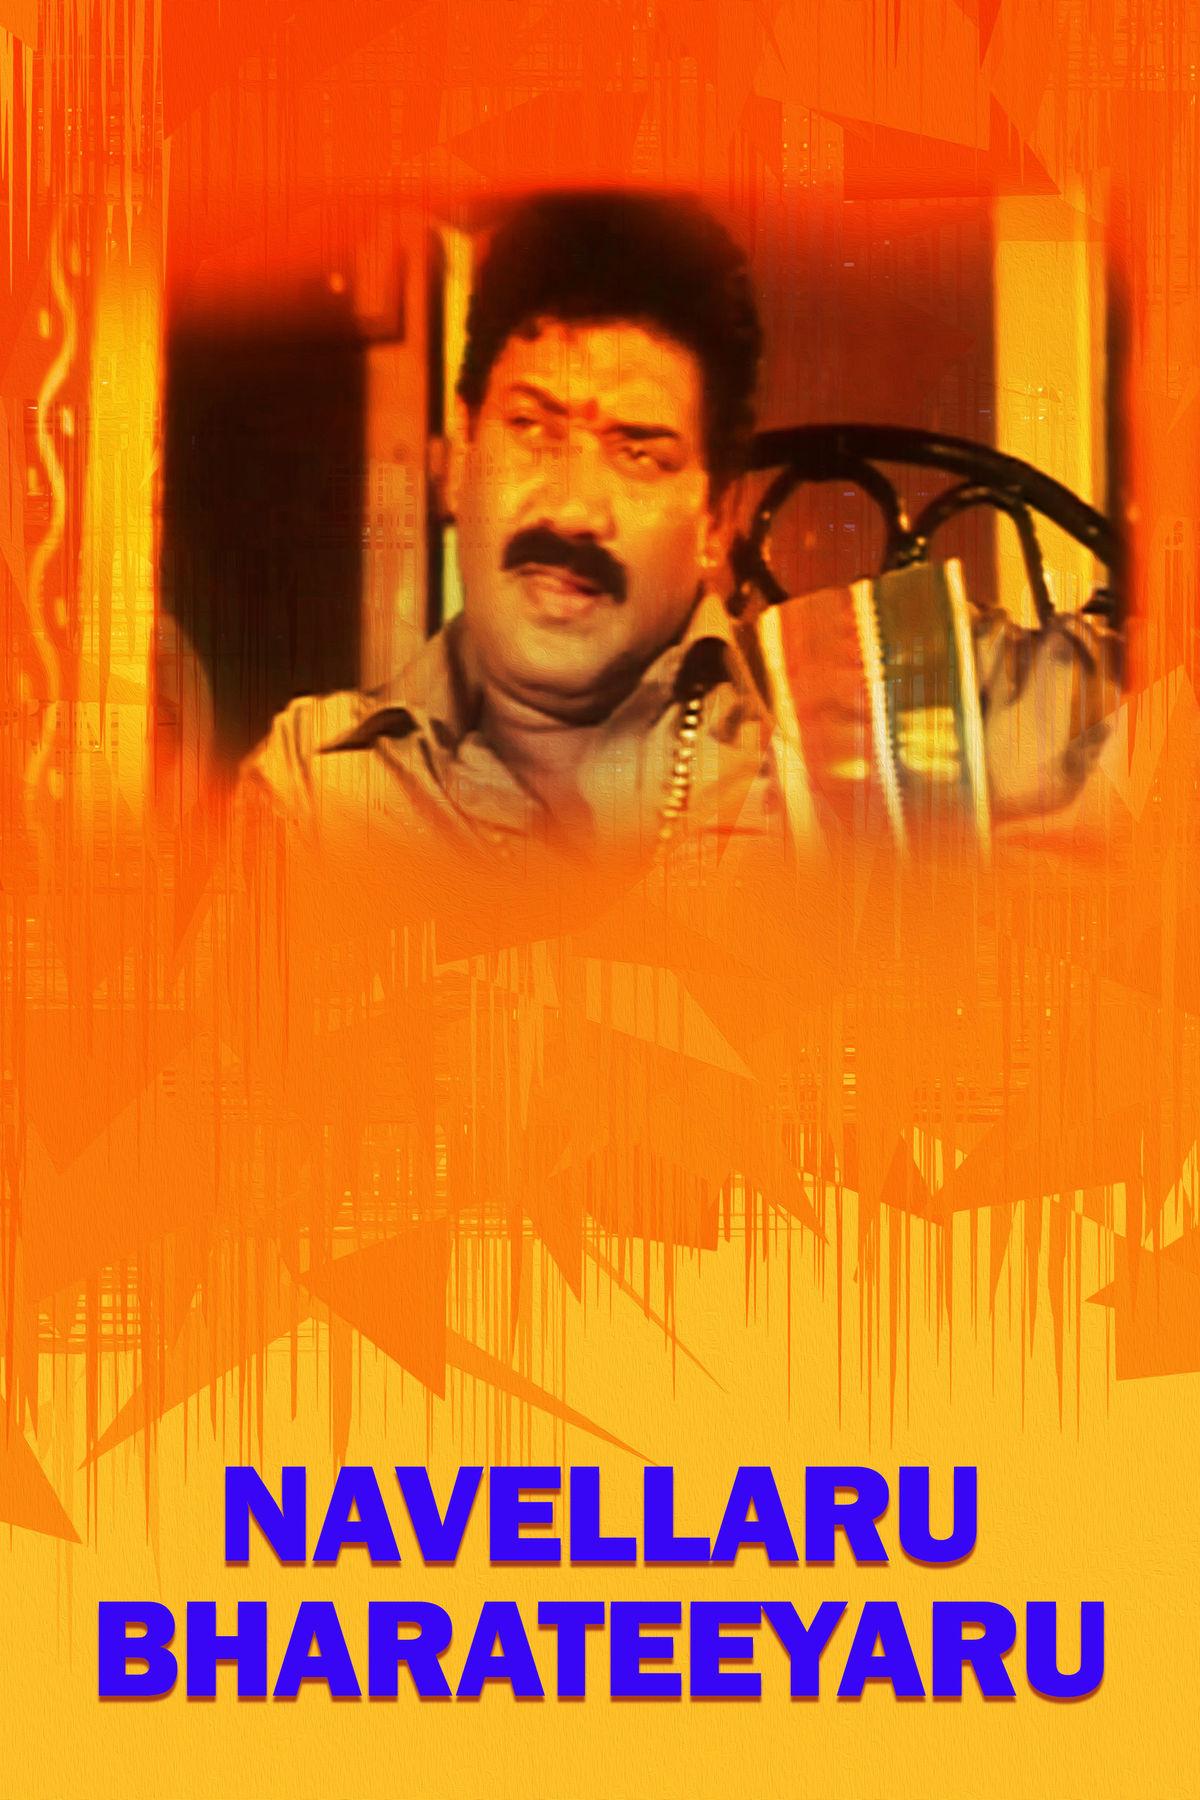 Navellaru Bharateeyaru